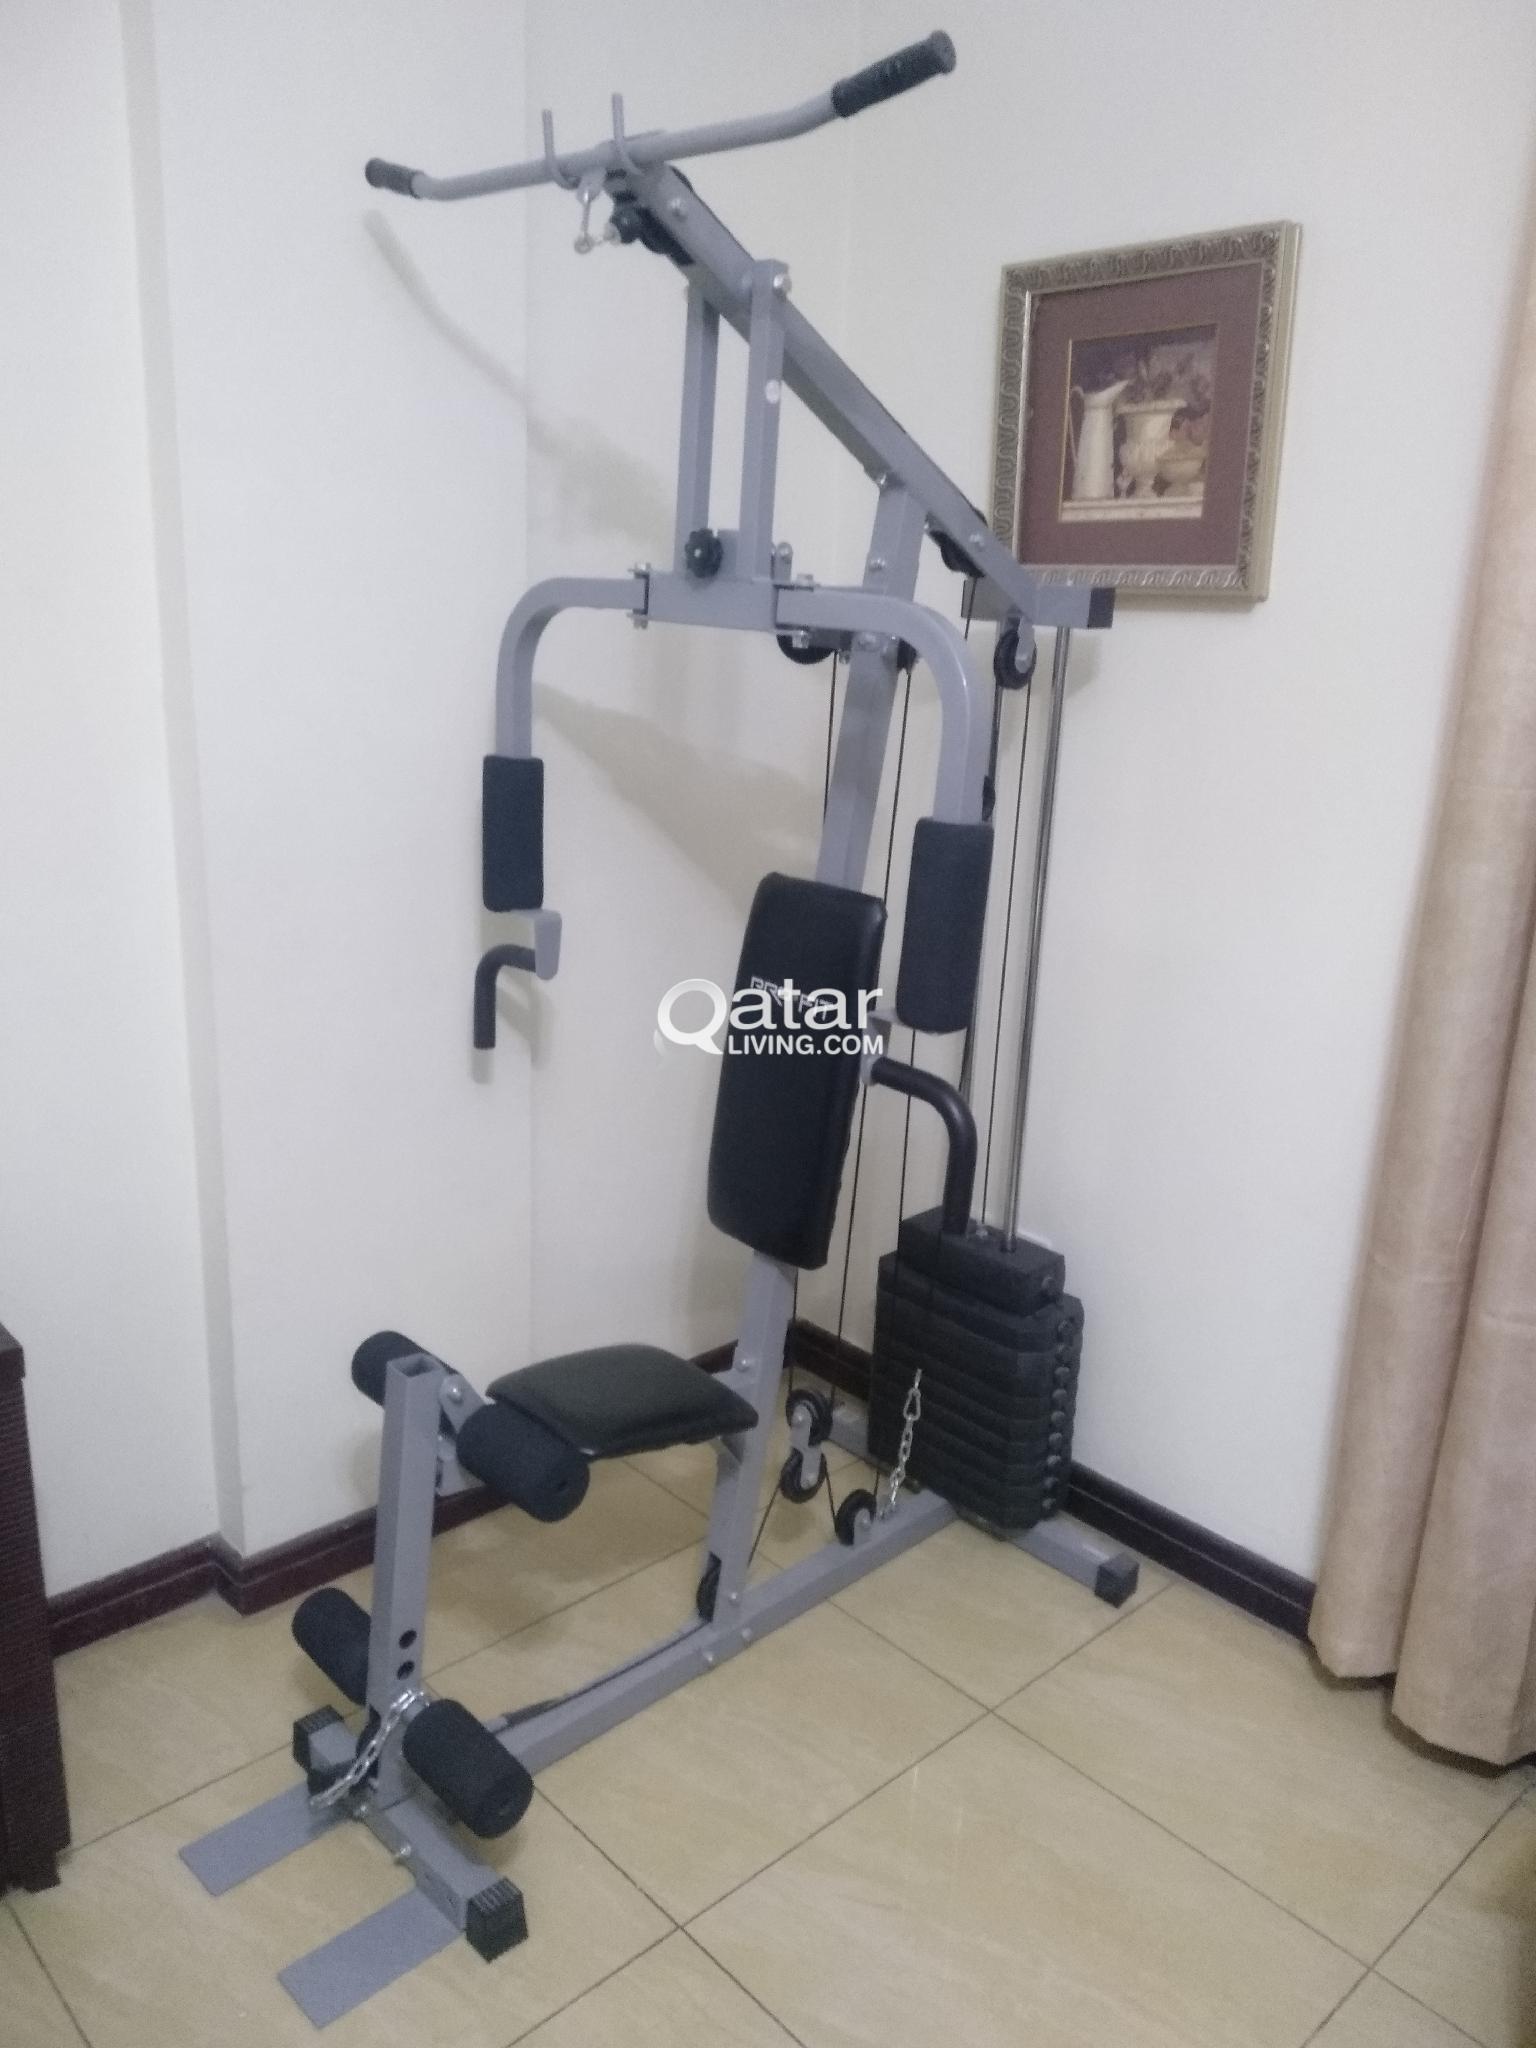 Home gym equipment for sale qatar living